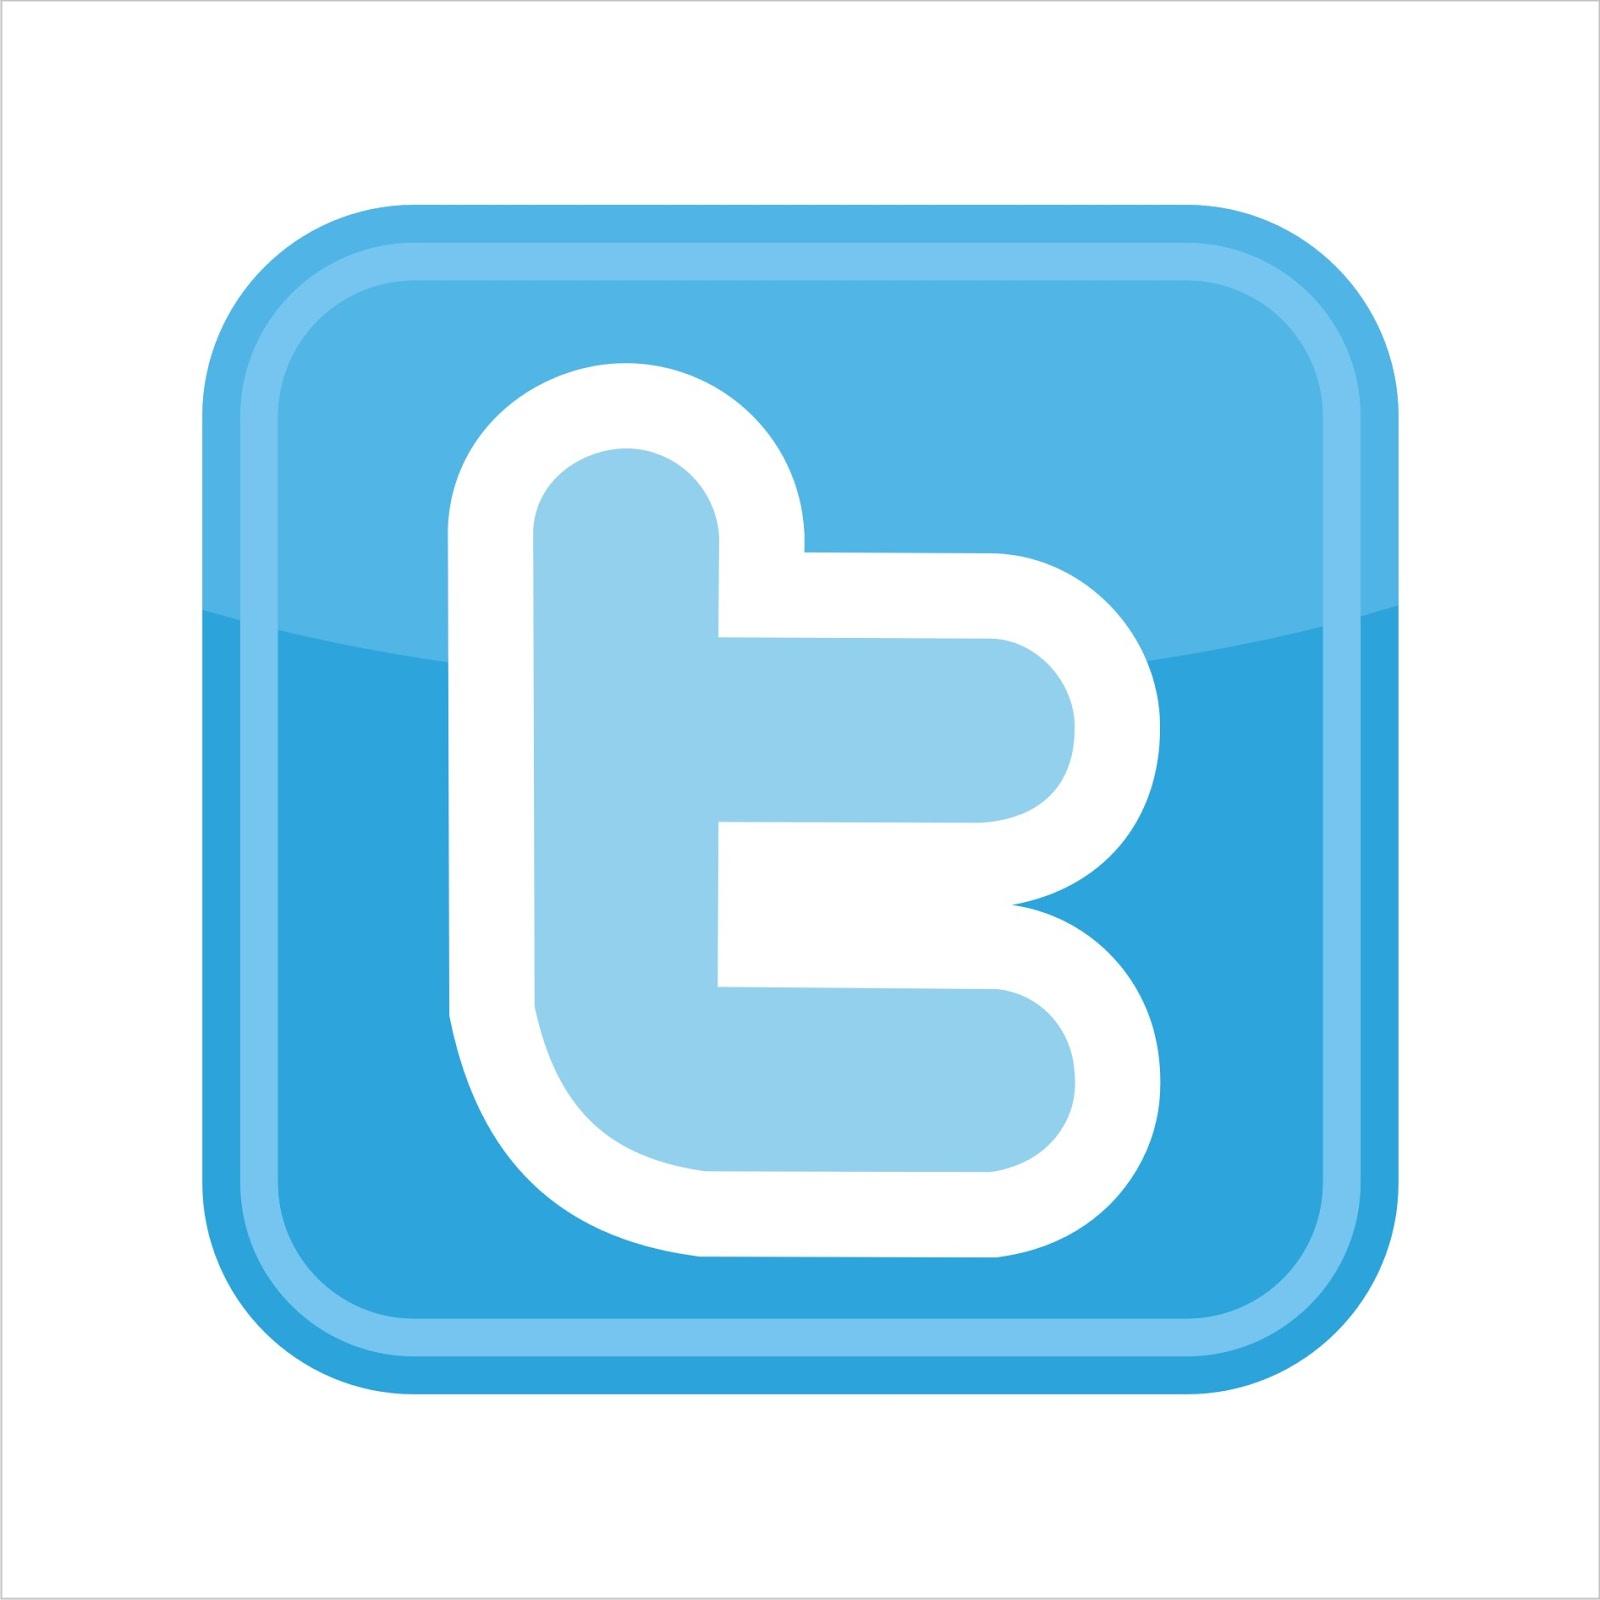 Free Download Logo Blackberry, Facebook, Twitter, WhatsApp